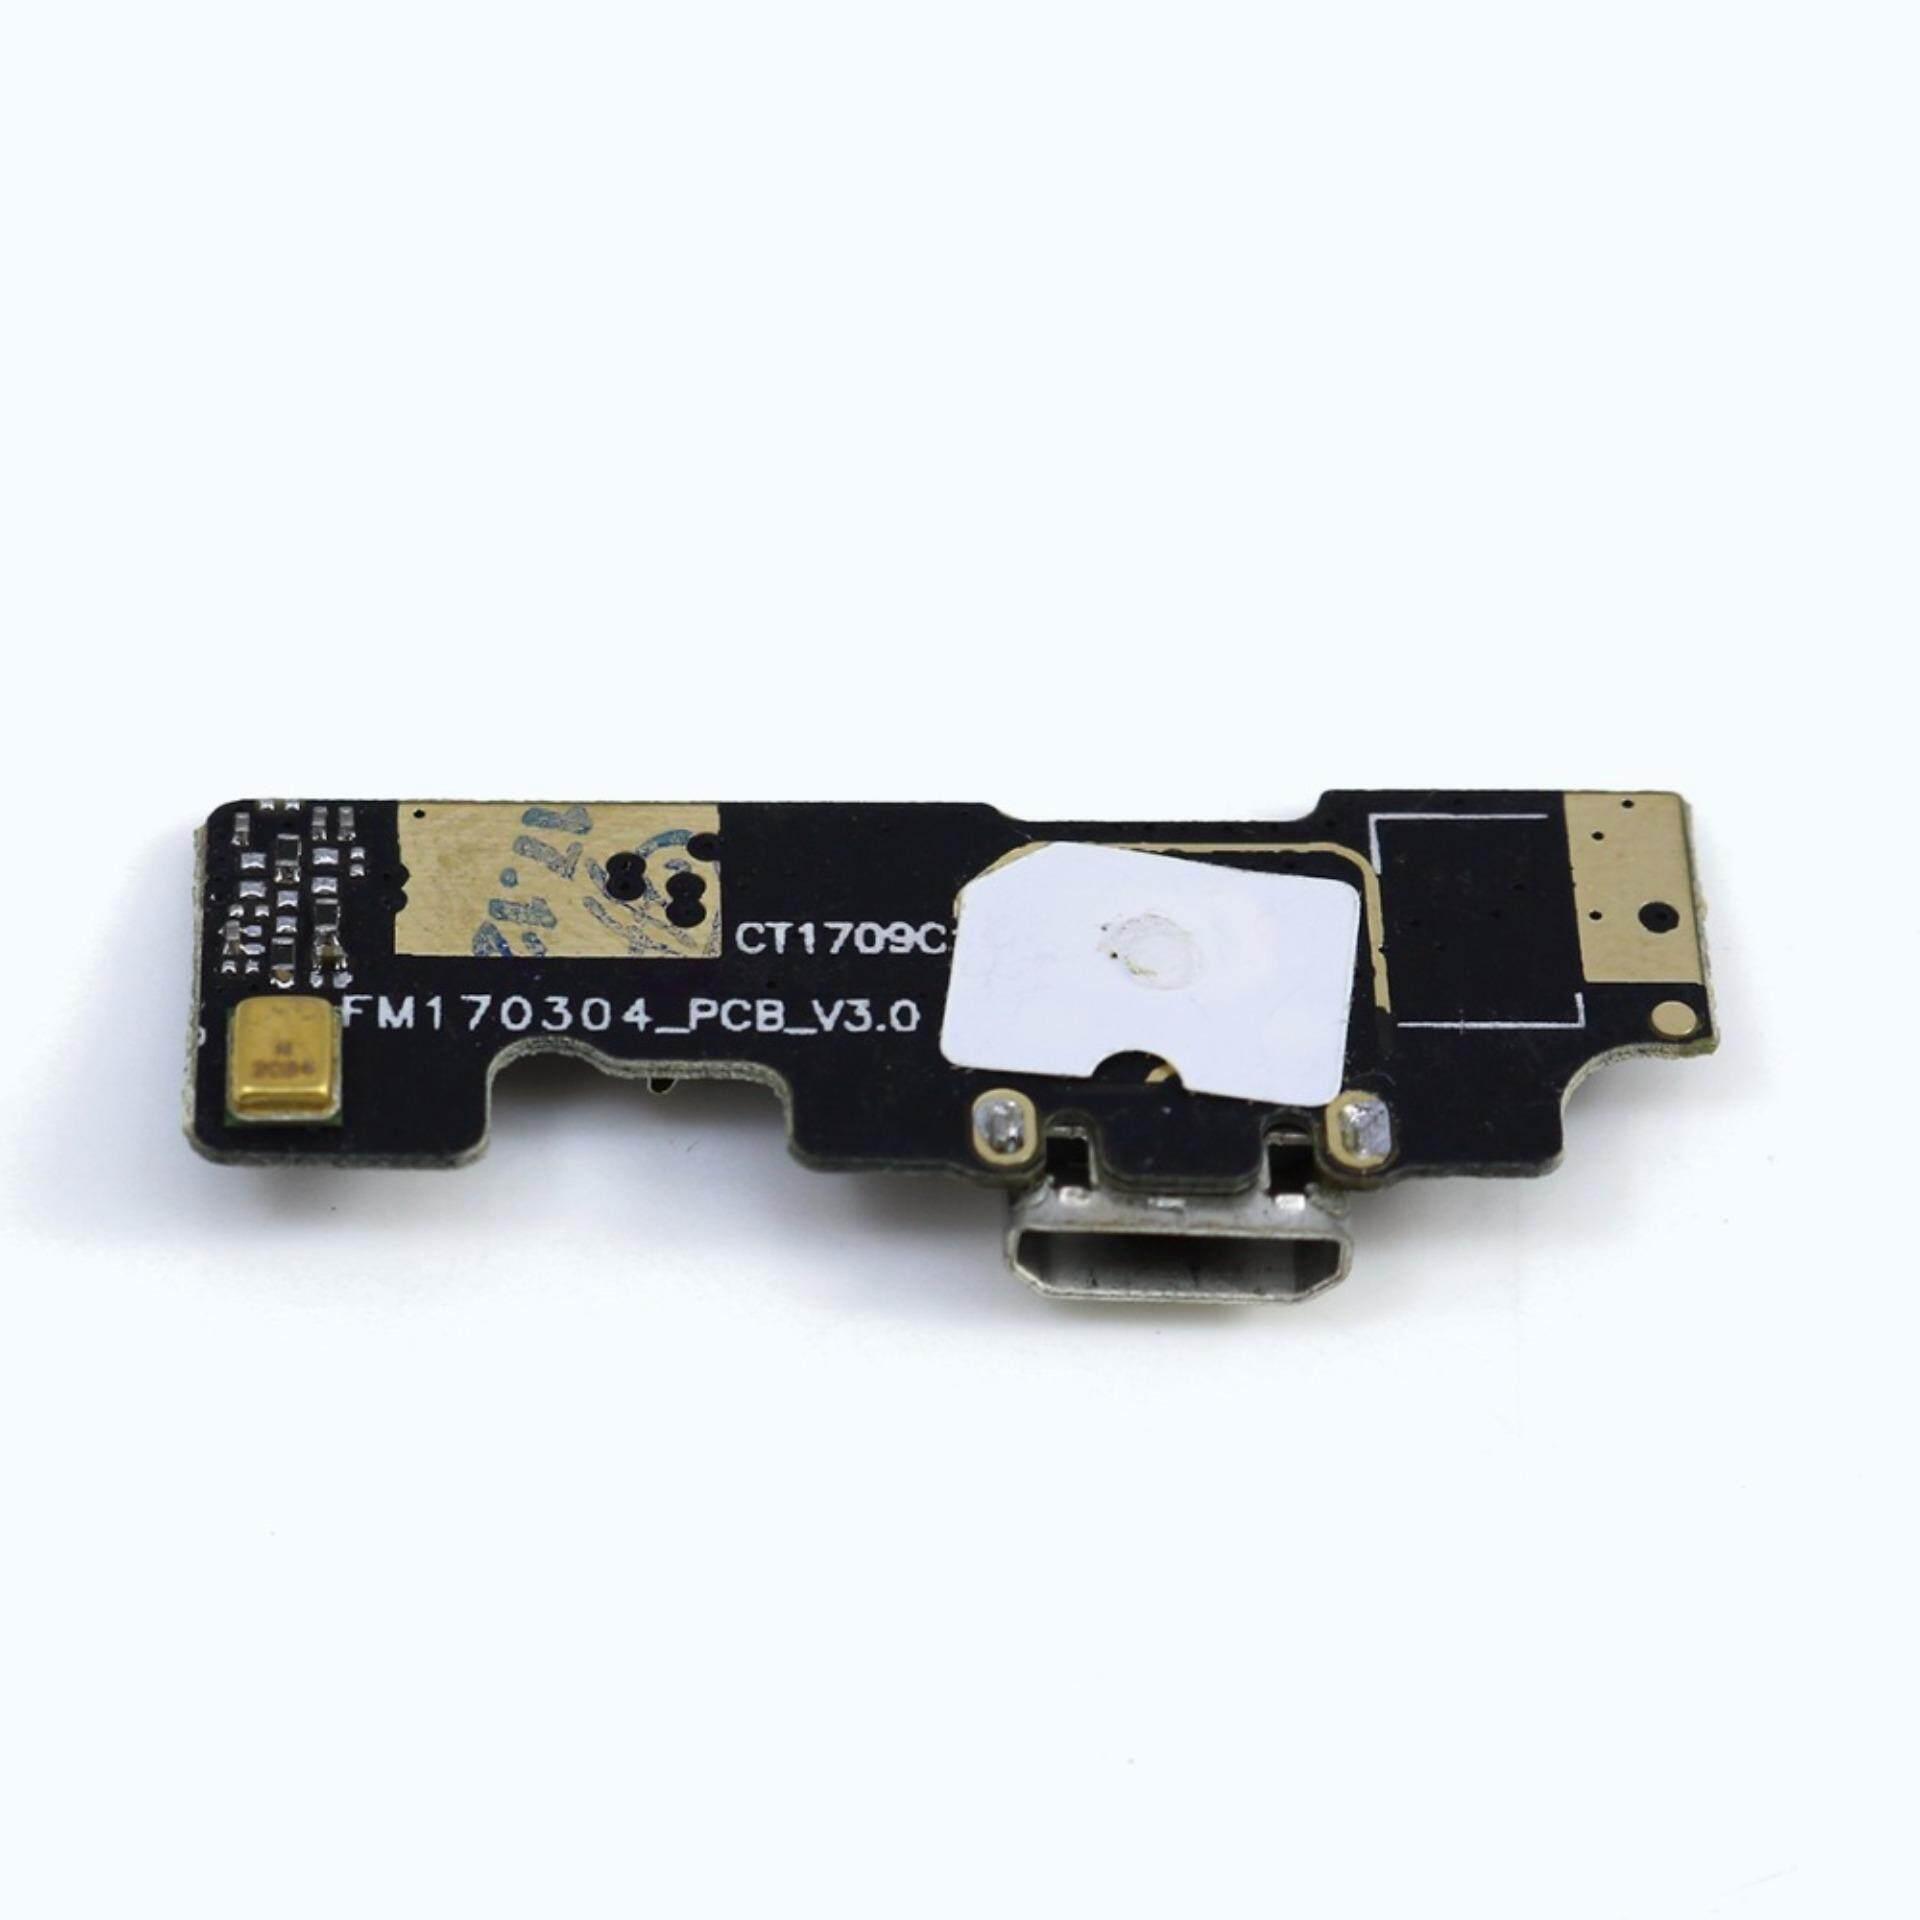 1Piece Dock Connector Micro USB Charger Charging Port Flex for MEIZU MX3 MX4 MX4 PRO MX5